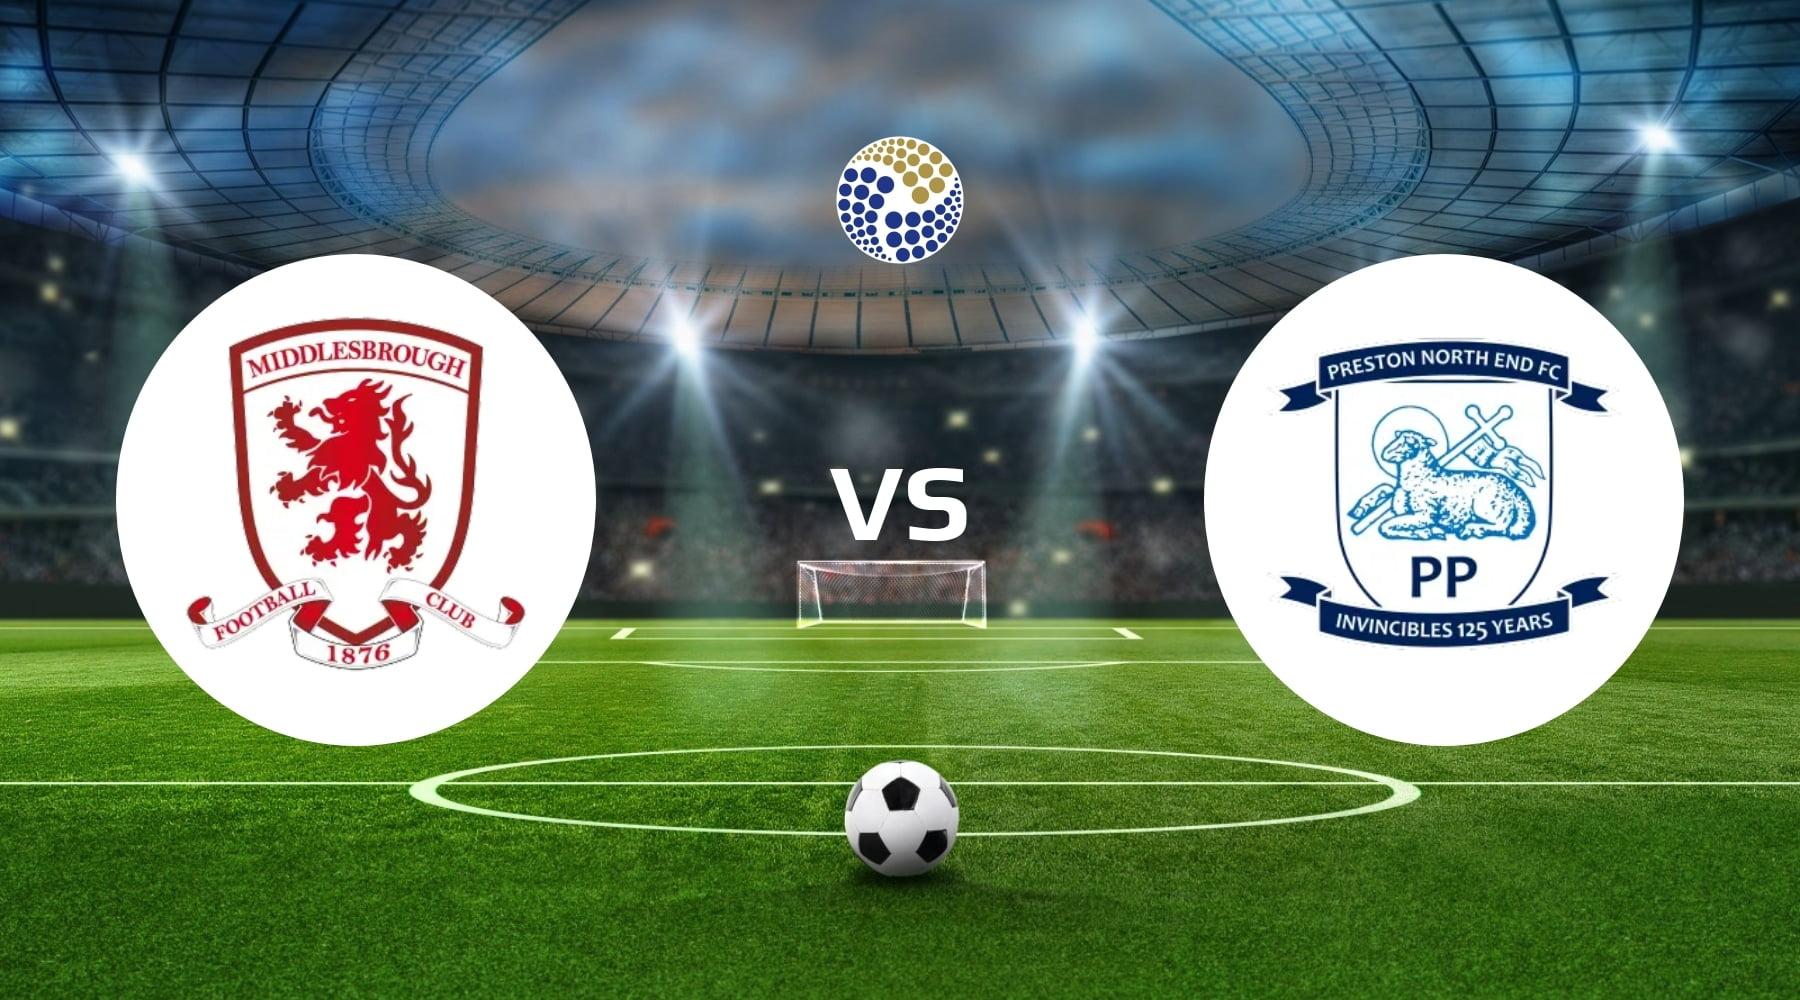 Middlesbrough vs Preston North End Betting